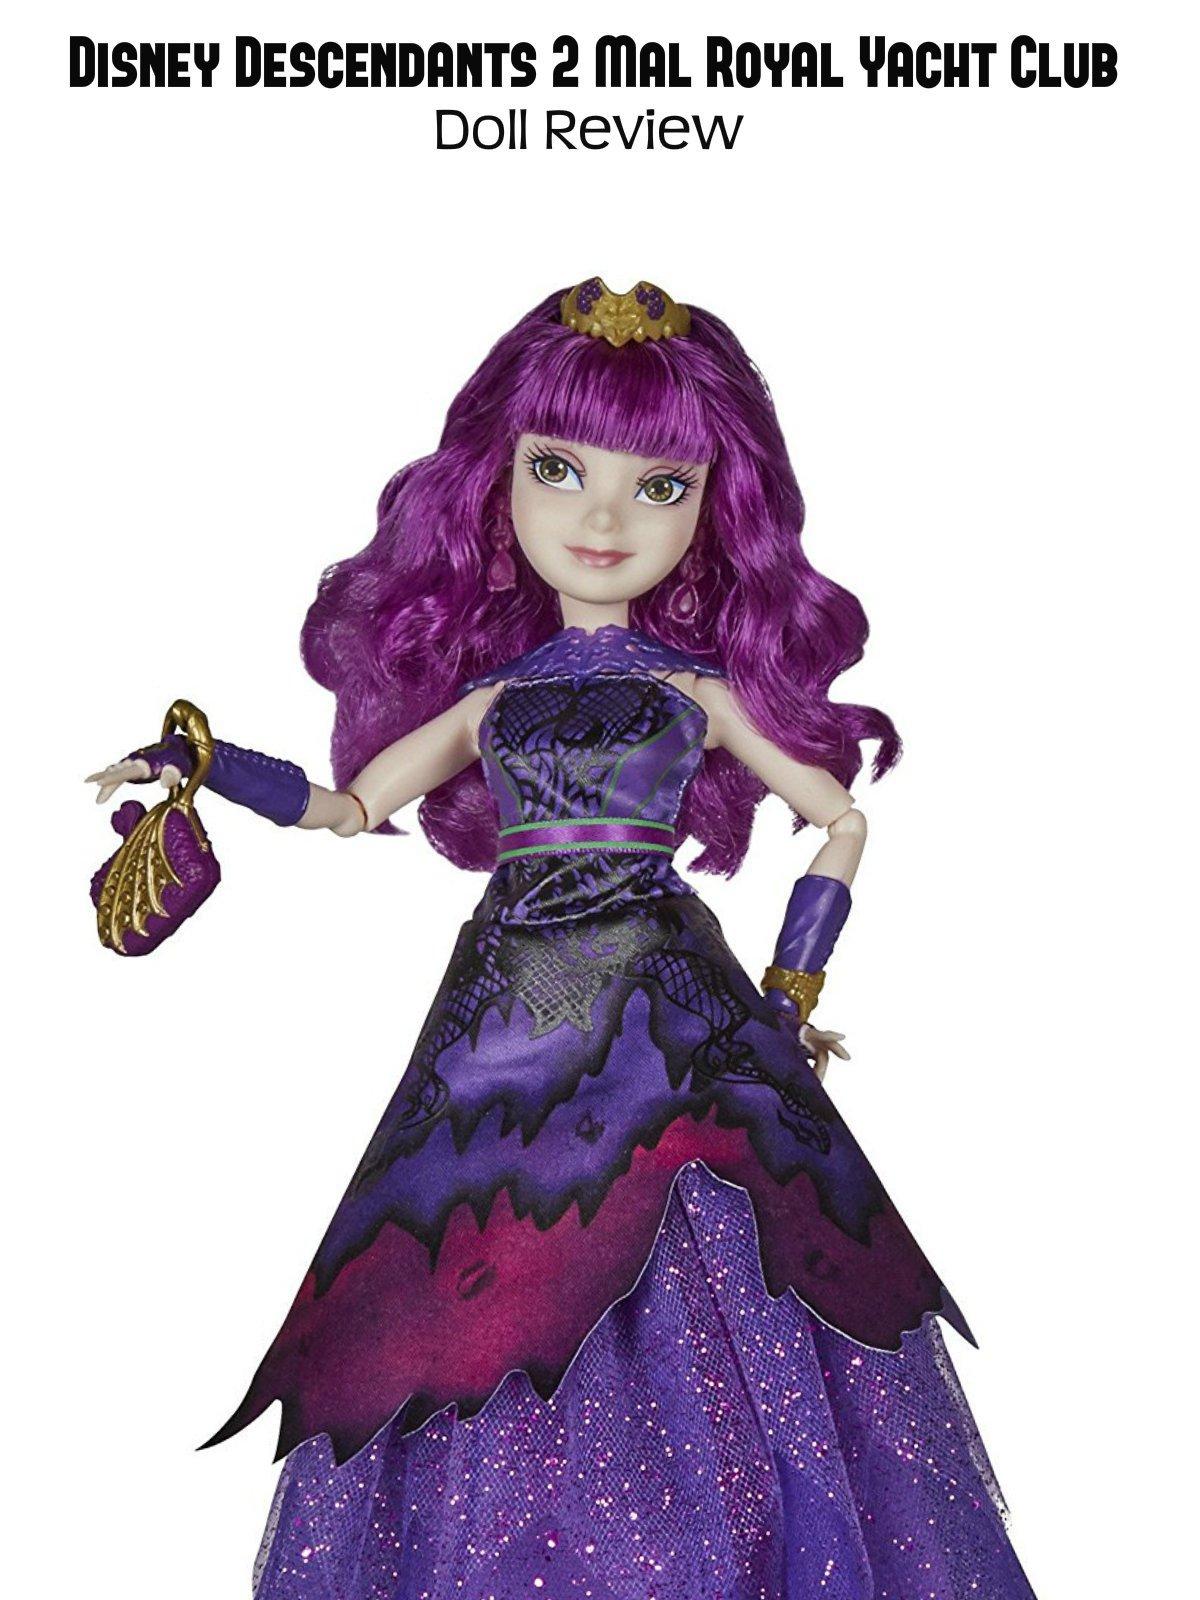 Review: Disney Descendants 2 Mal Royal Yacht Club Doll Review